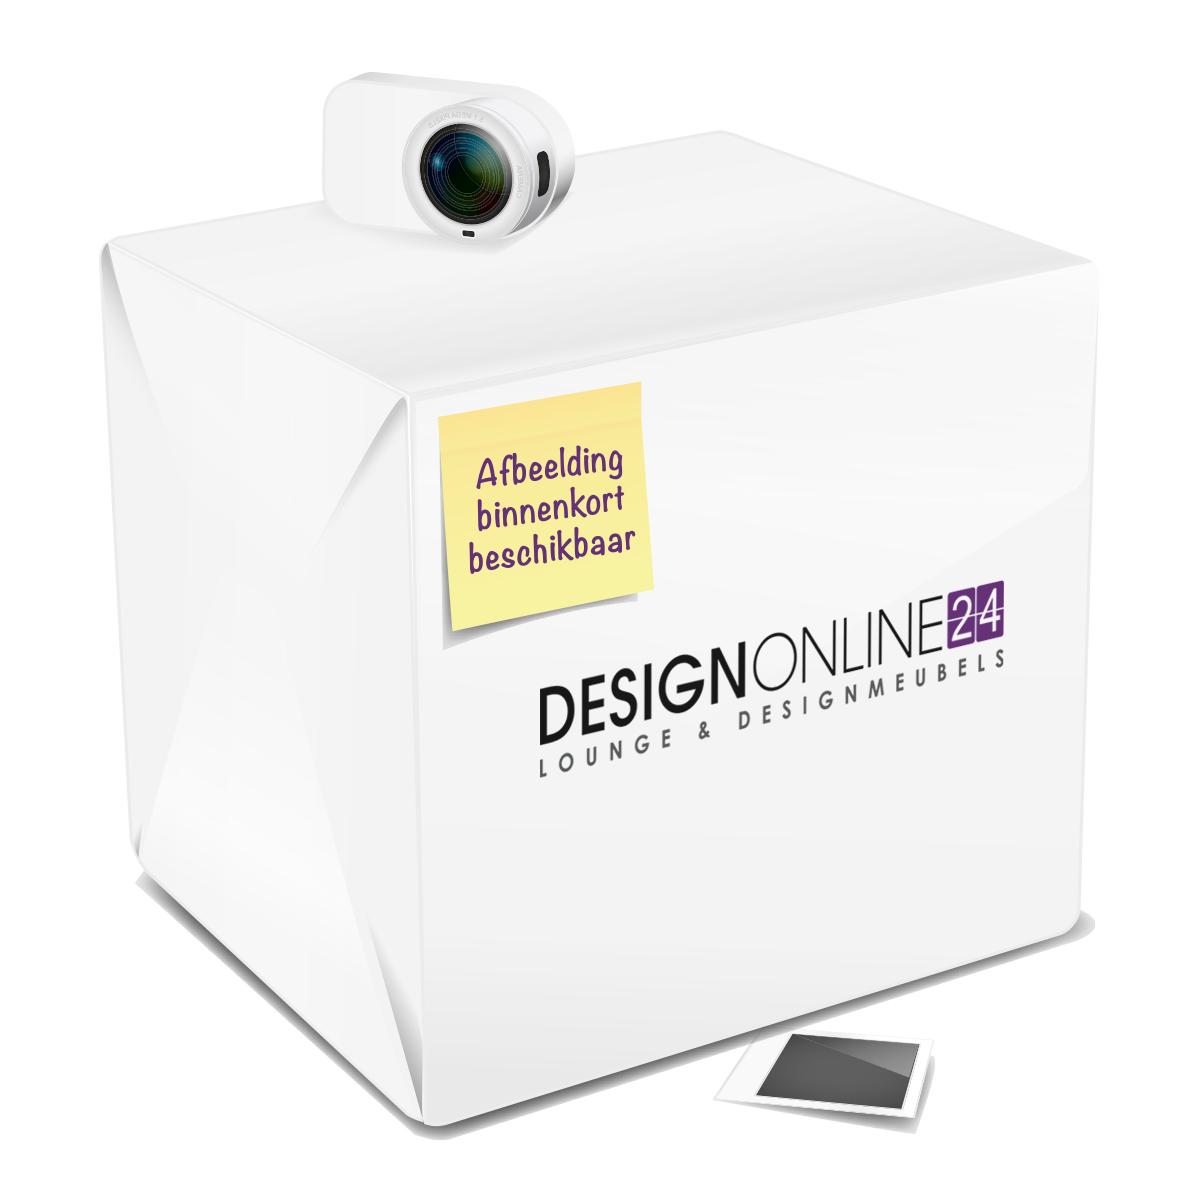 24Designs 24Designs Barkruk Tessa - Zithoogte 85 cm - Mat RVS onderstel - Kunstleren zitting - Wit